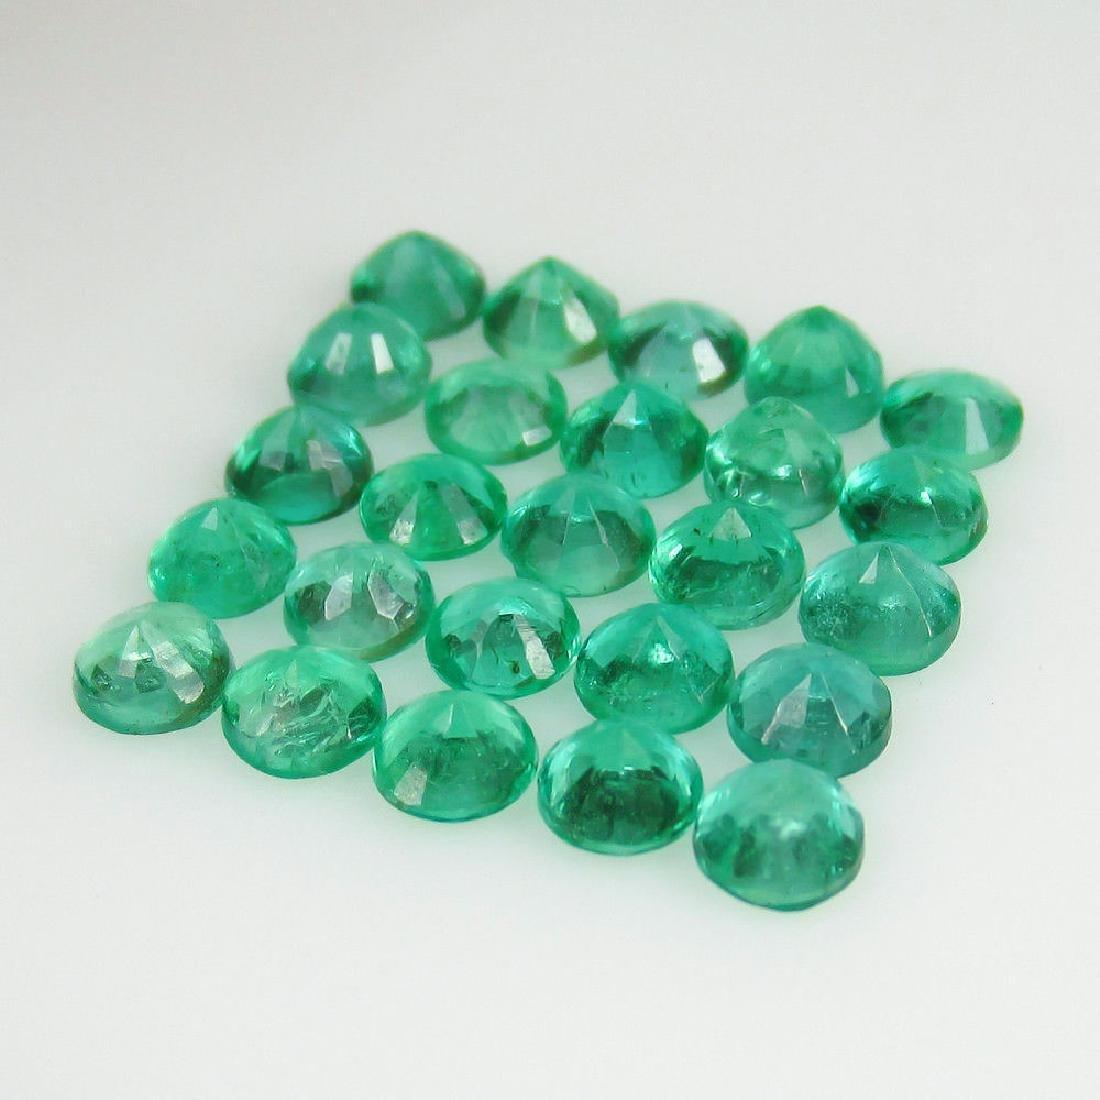 4.04 Ctw Natural 25 Loose Calibrate Emerald 3.5 mm